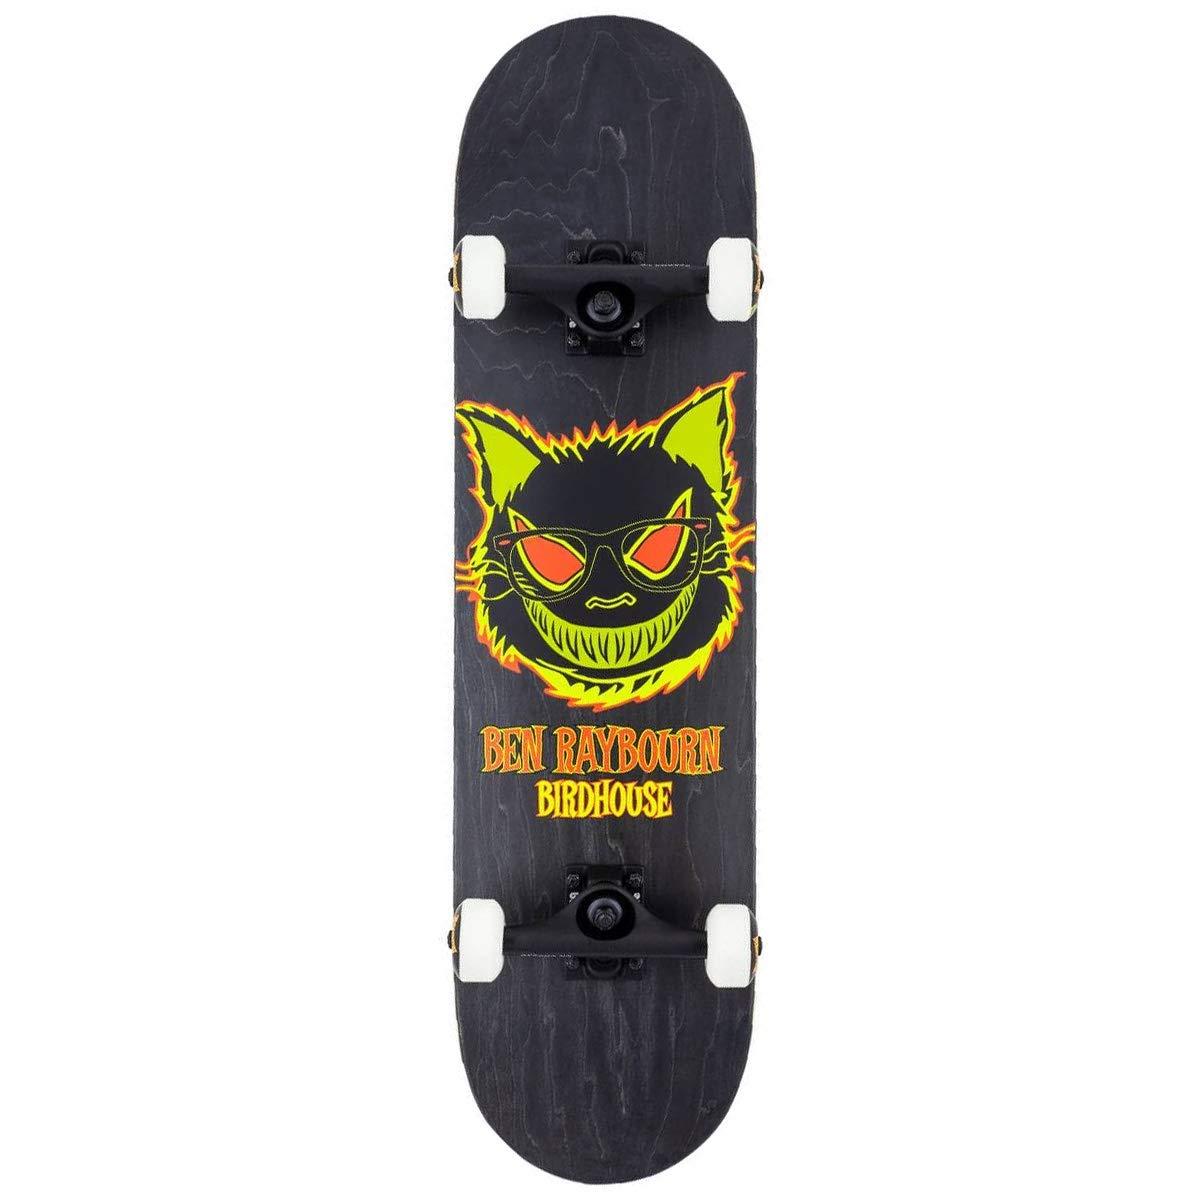 Birdhouse Complete Skateboard Raybourn Black